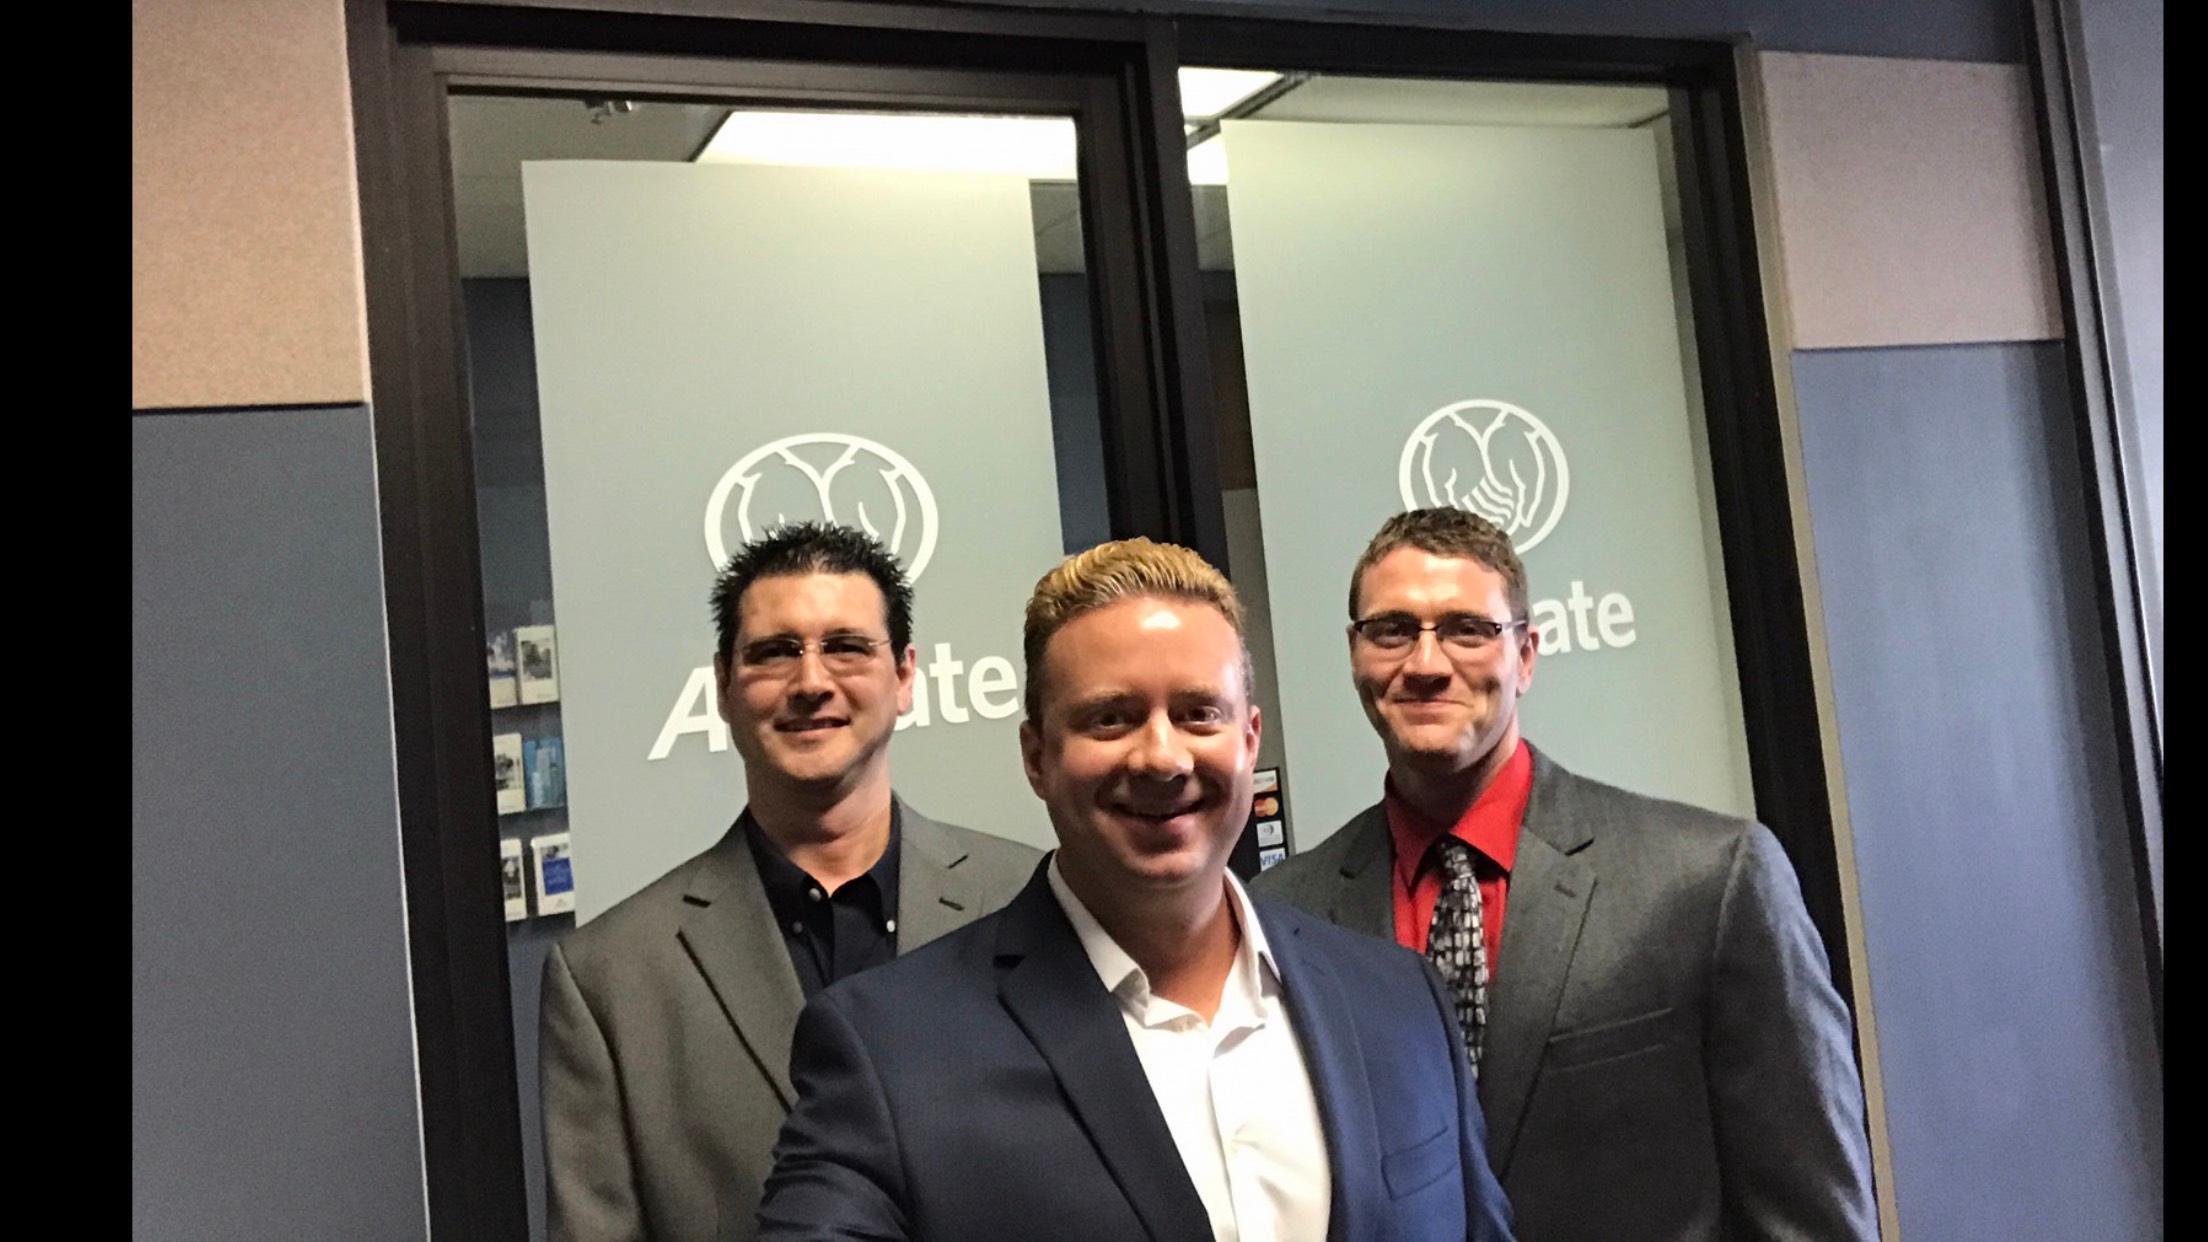 Matt Curtis: Allstate Insurance image 1